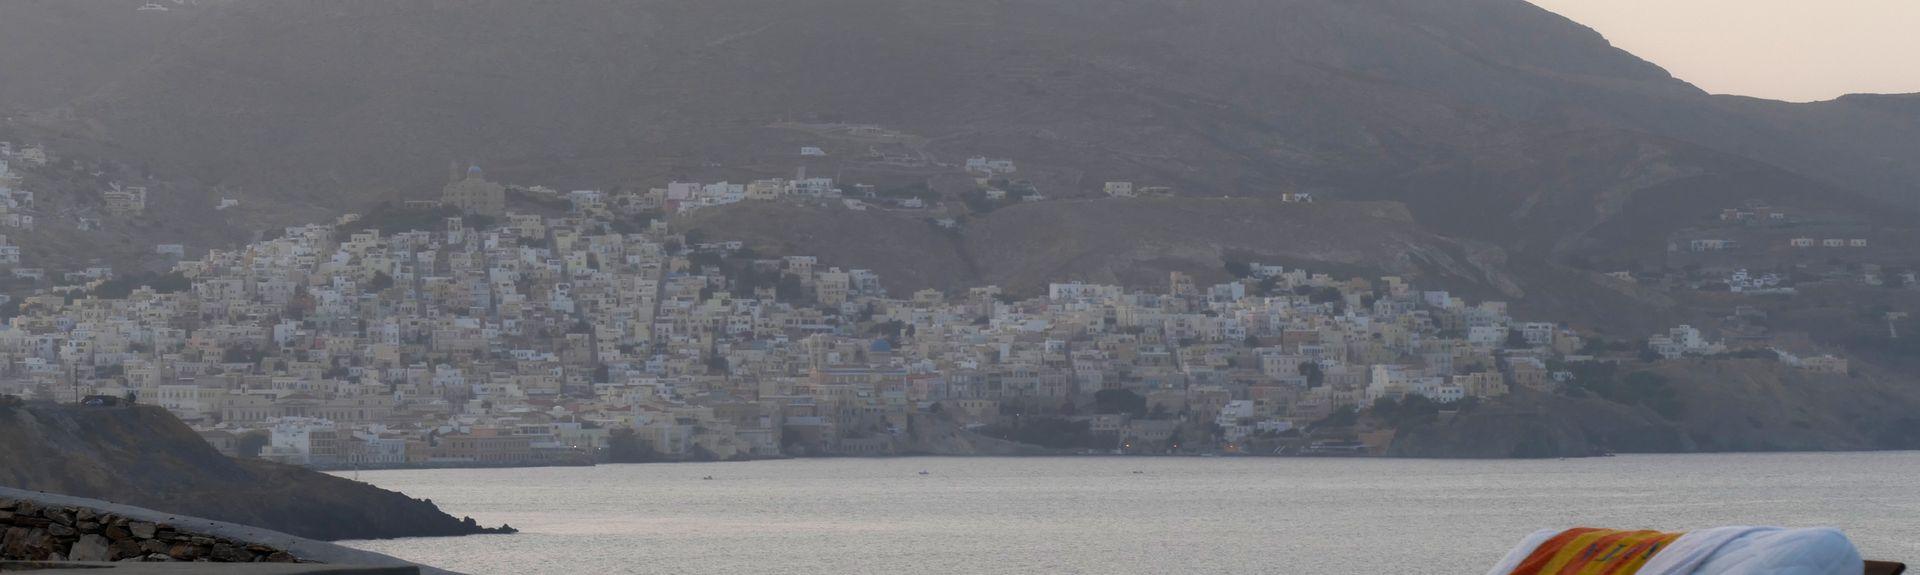 Poseidonia, Greece